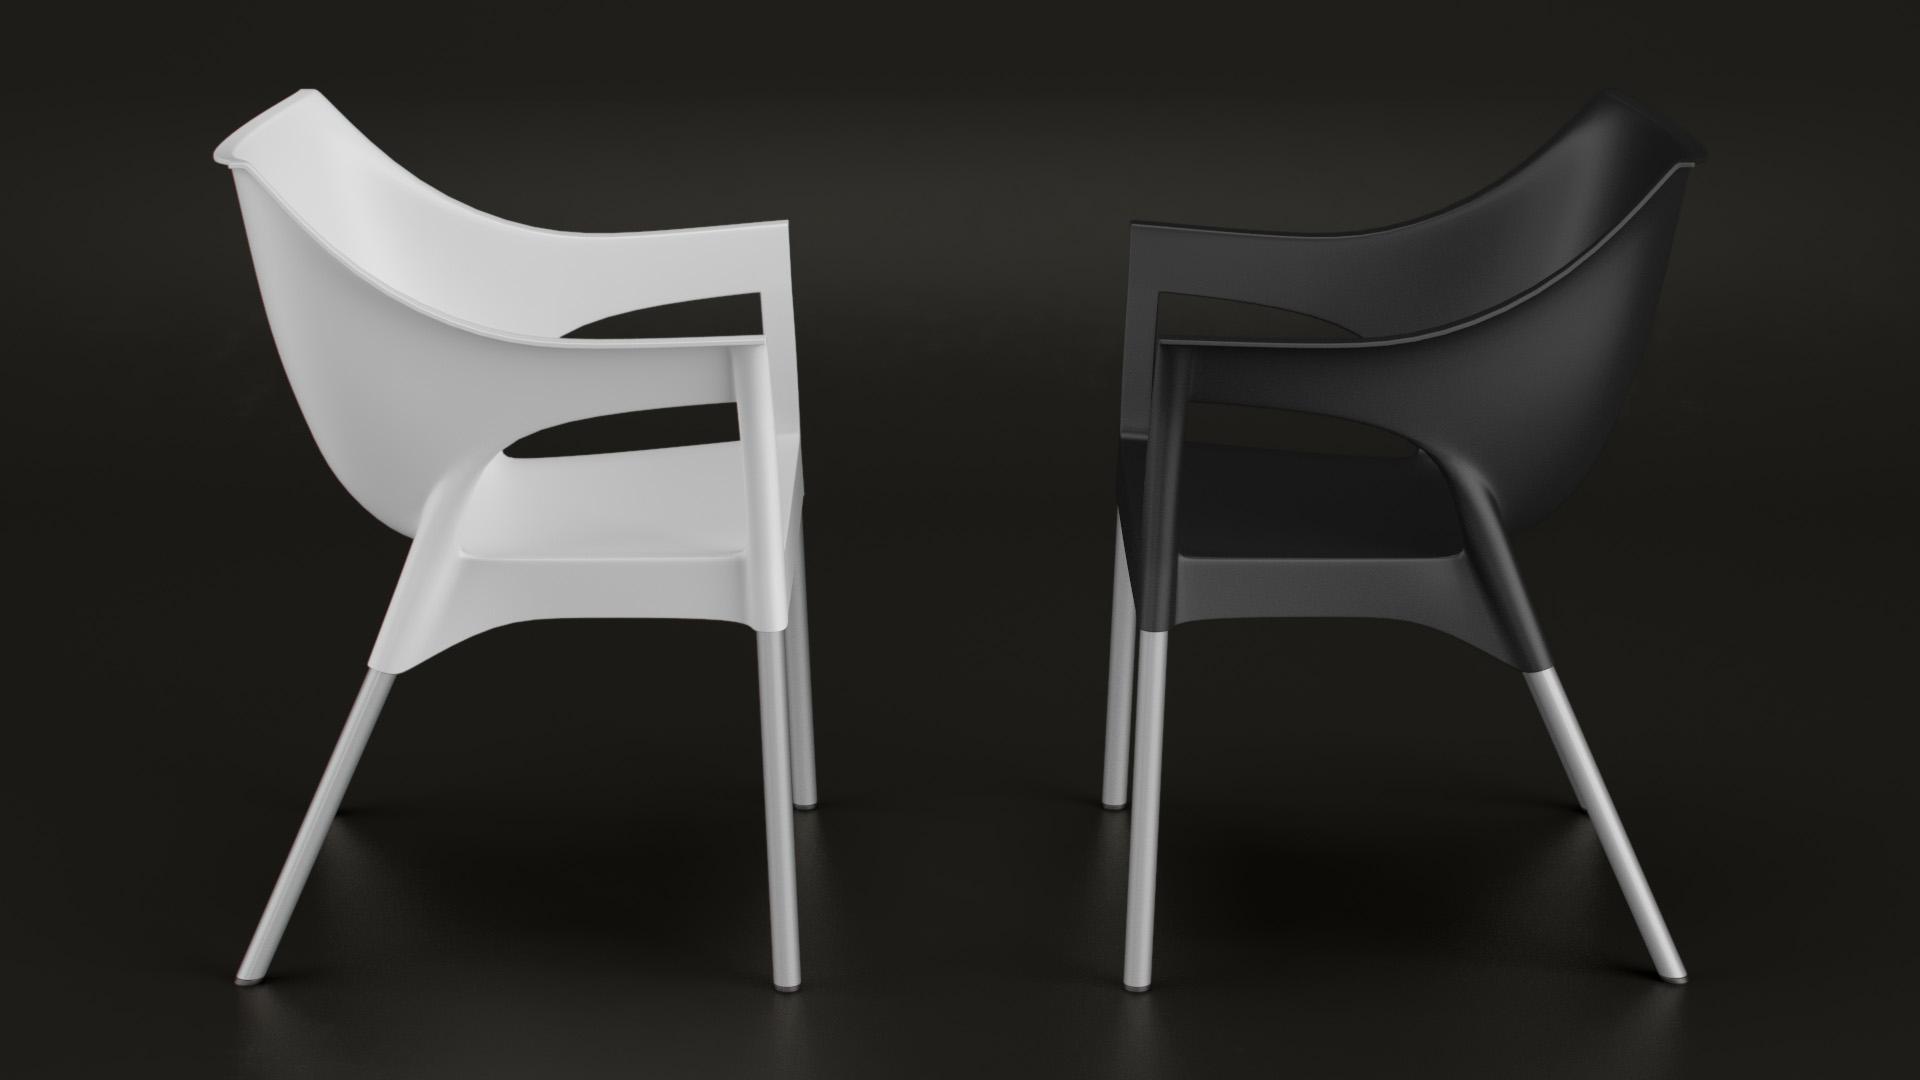 Pole_Chair_BlackSet_01_V1.01_0004